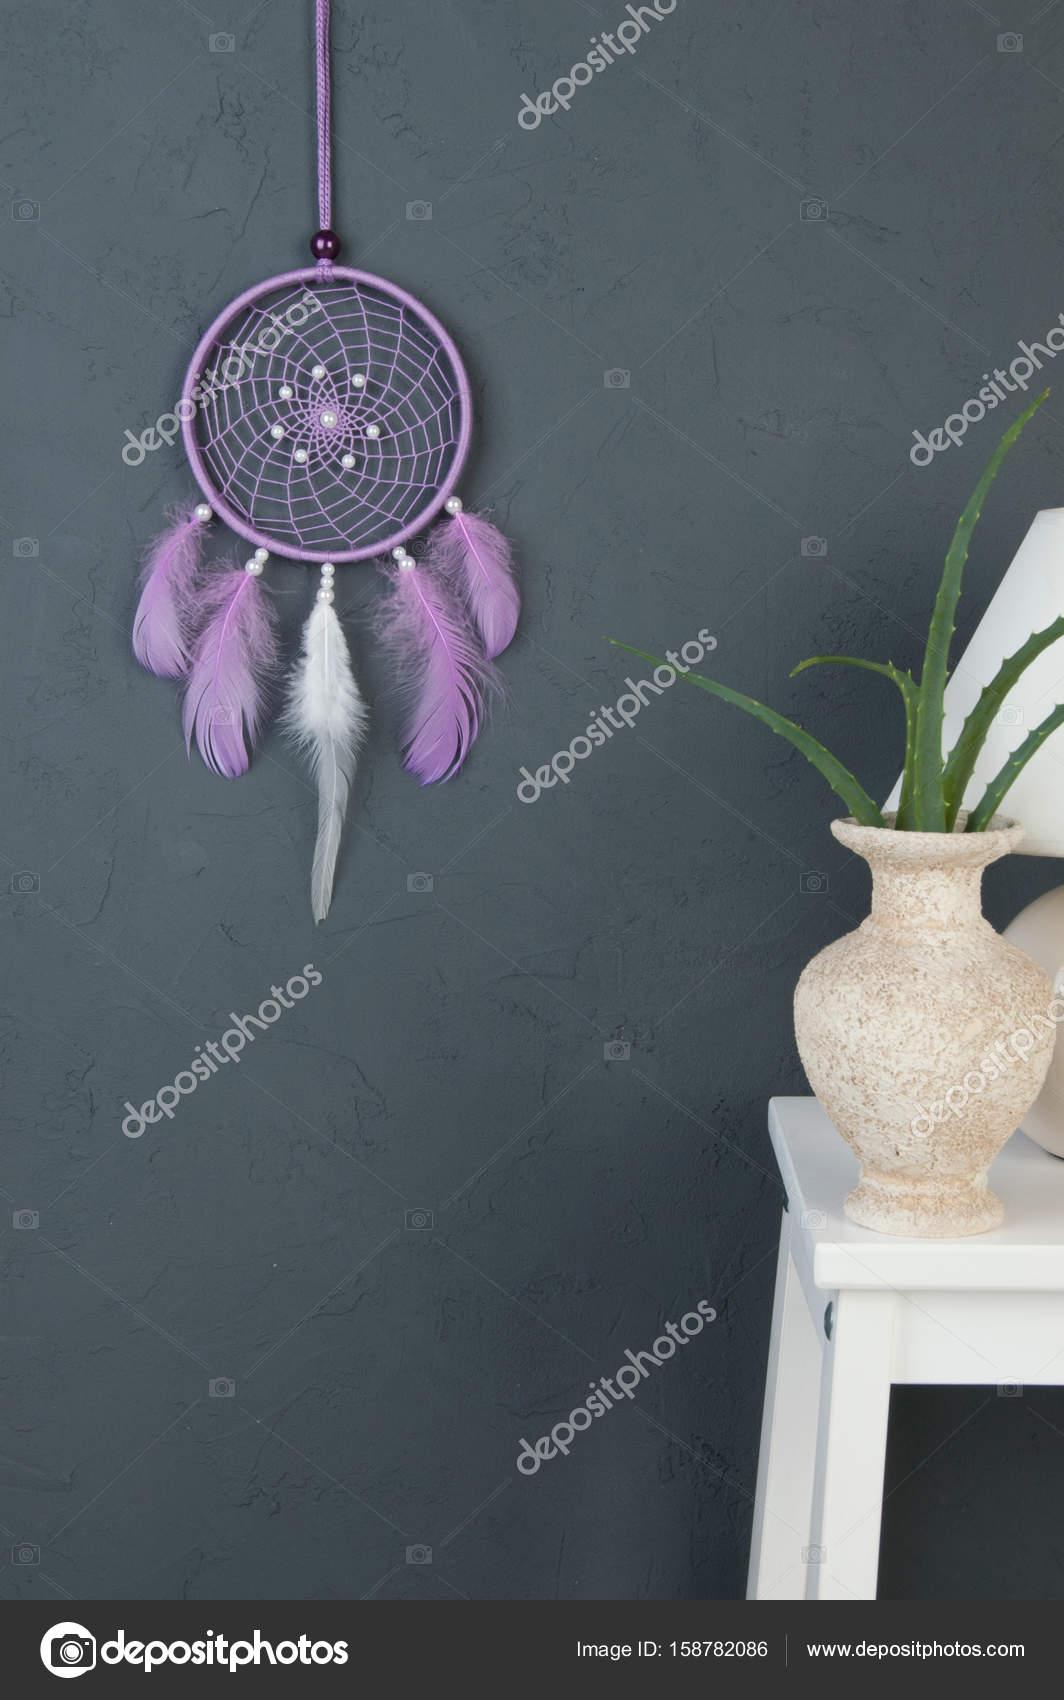 What dreams of lilac White lilac in a dream. Interpretation of dreams 27